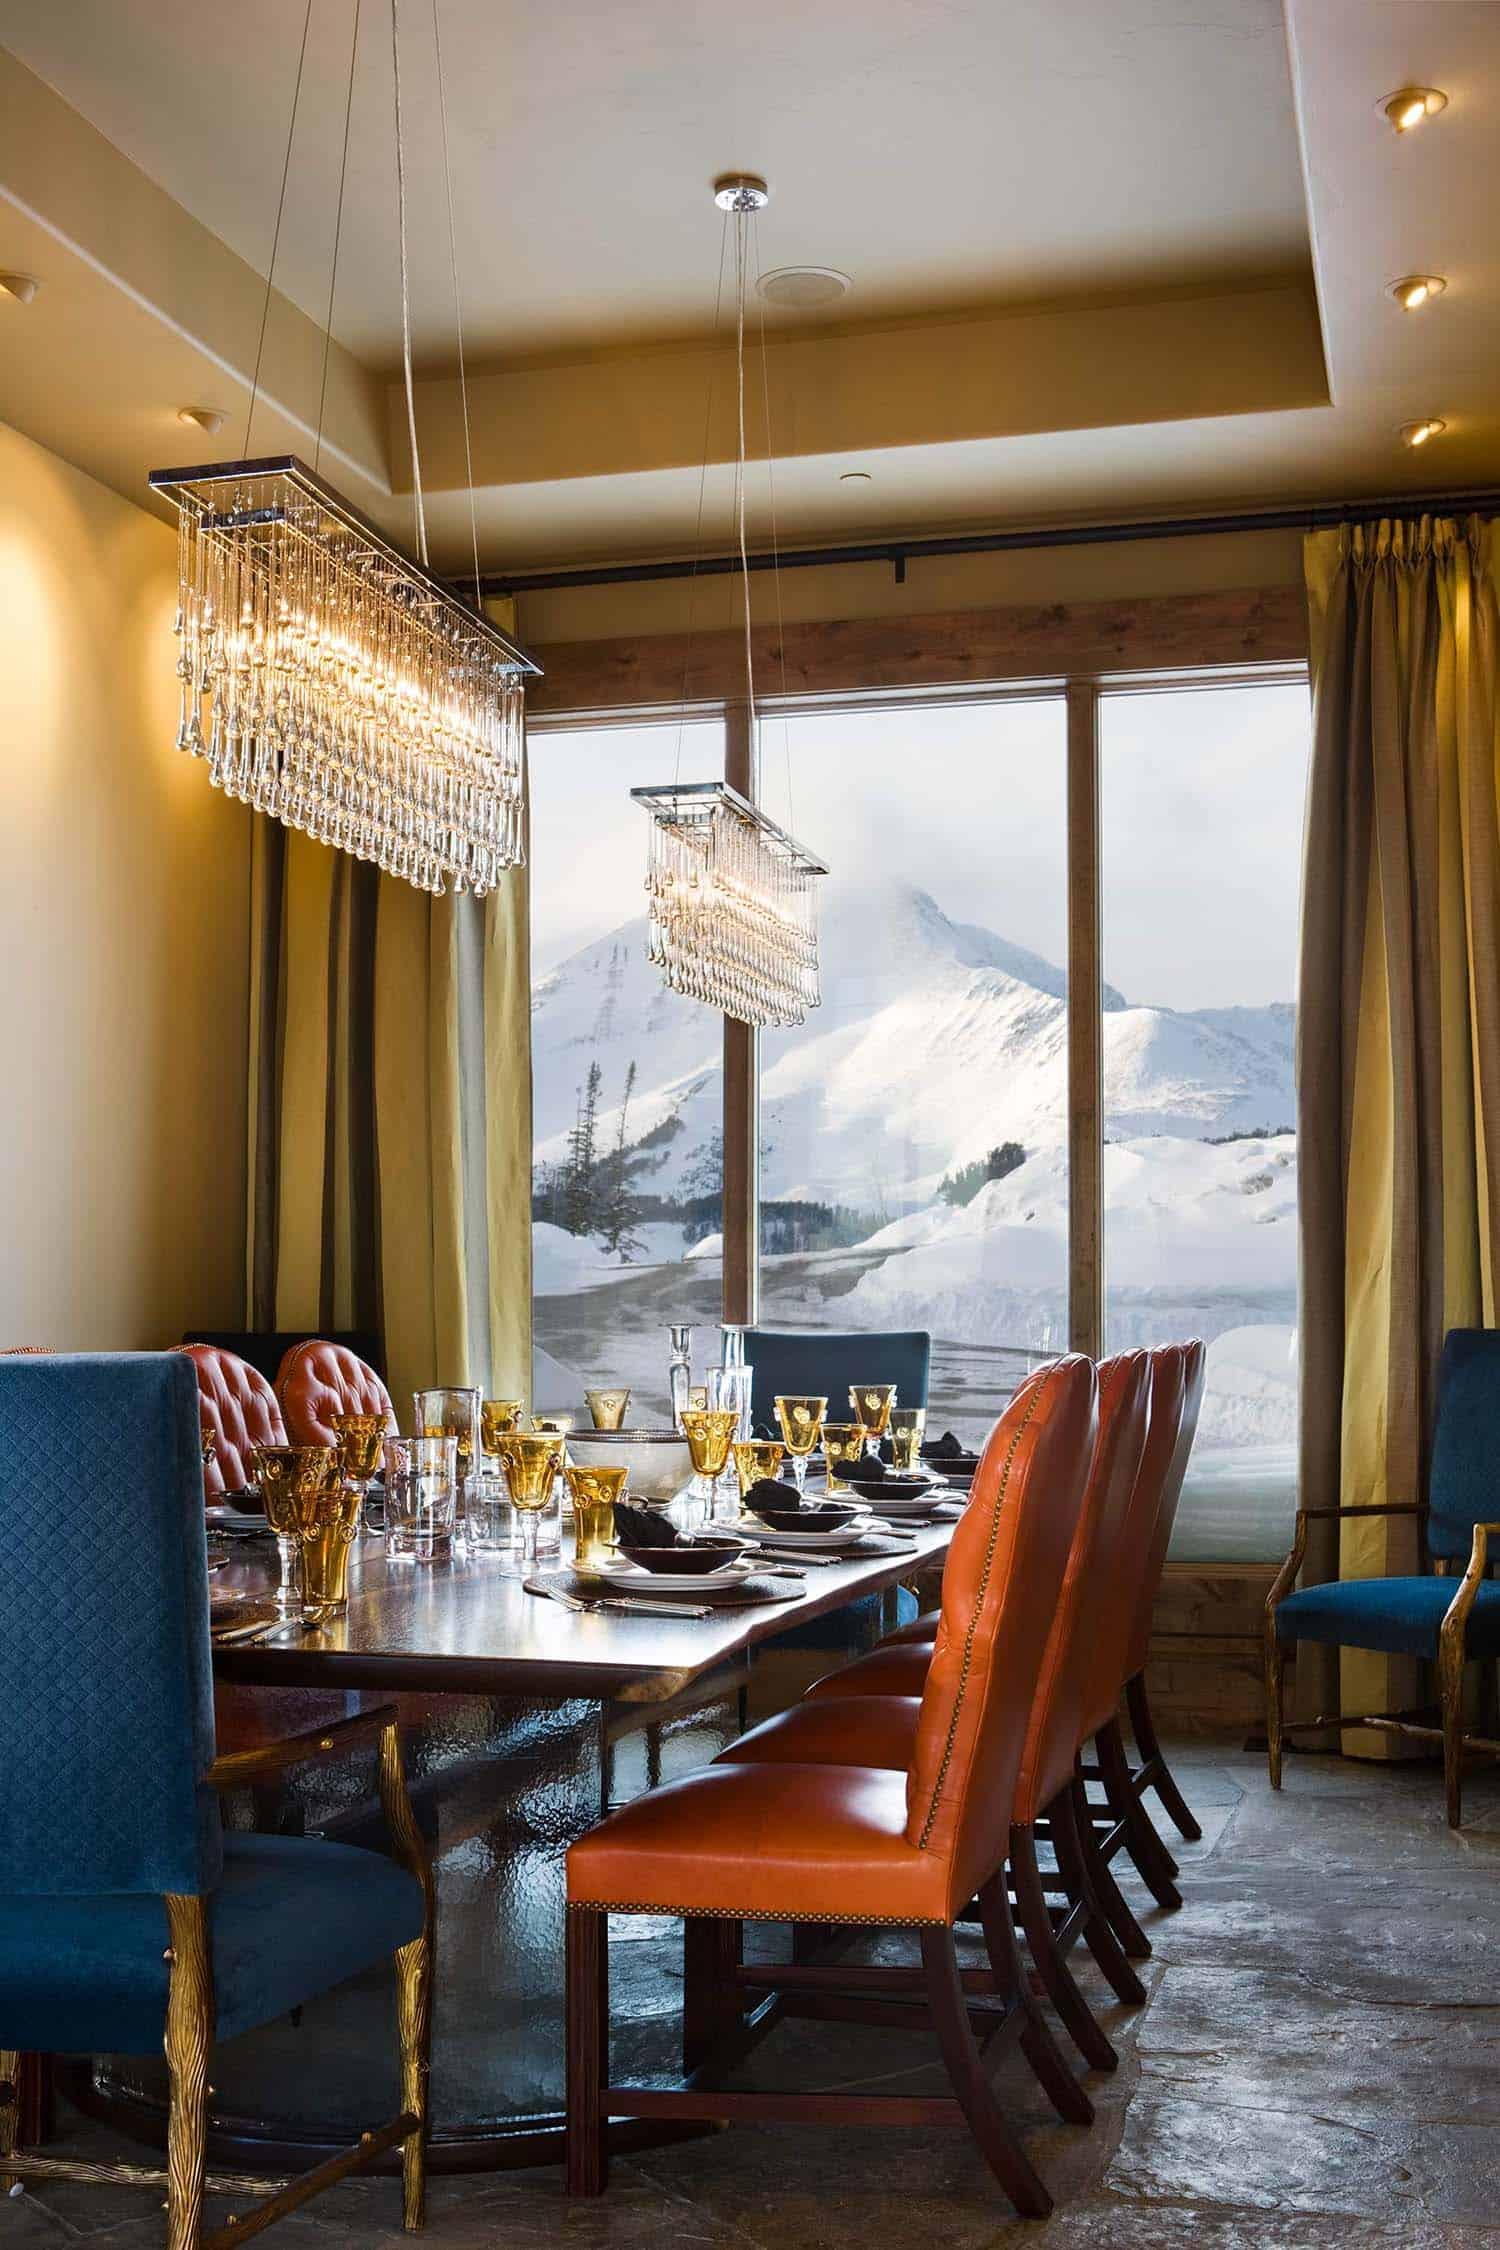 Modern-Rustic Mountain Home-Locati Architects-13-1 Kindesign